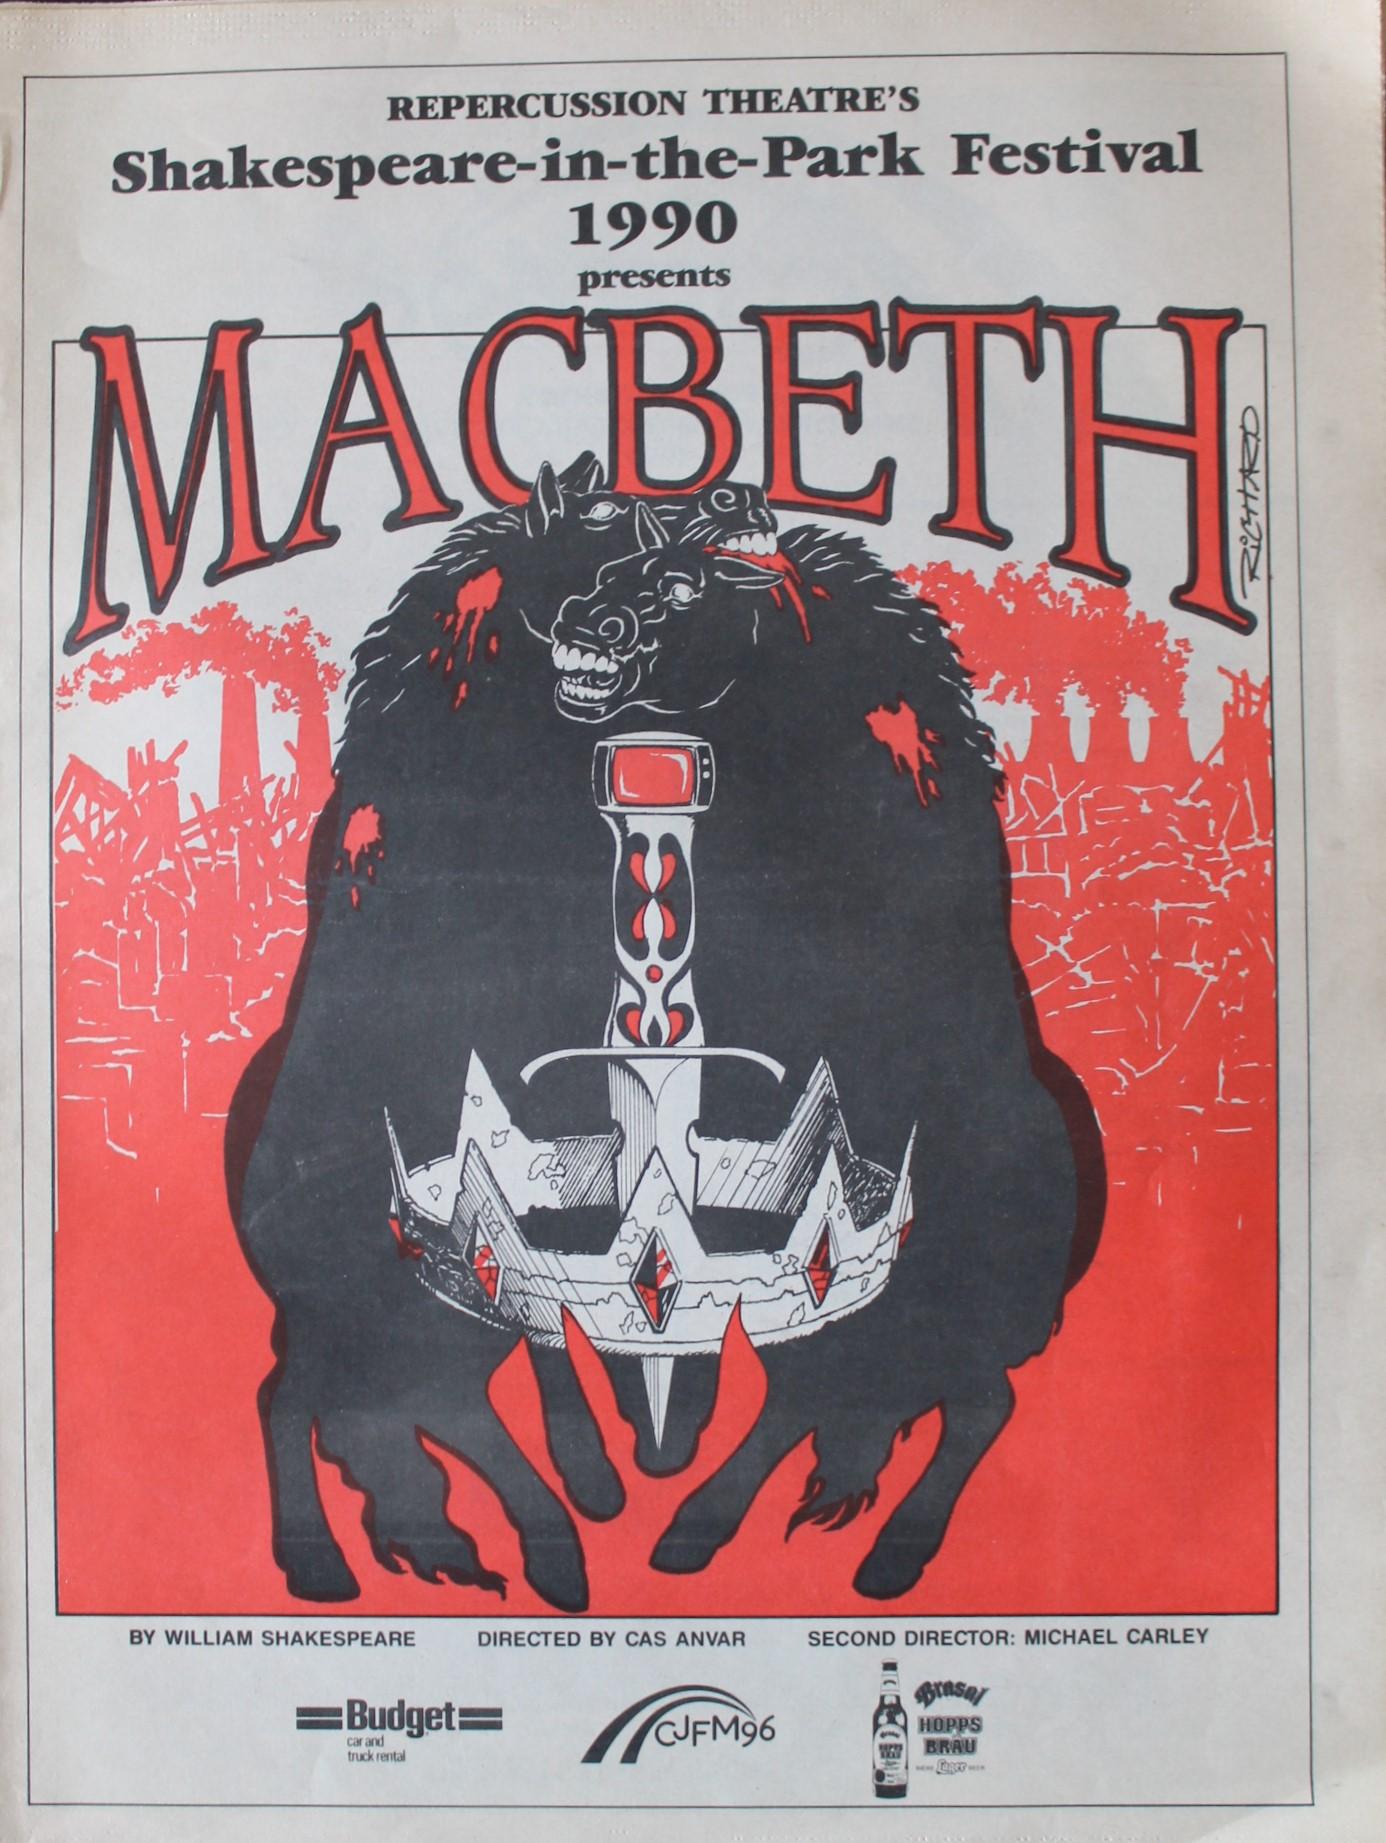 1990 Program Cover